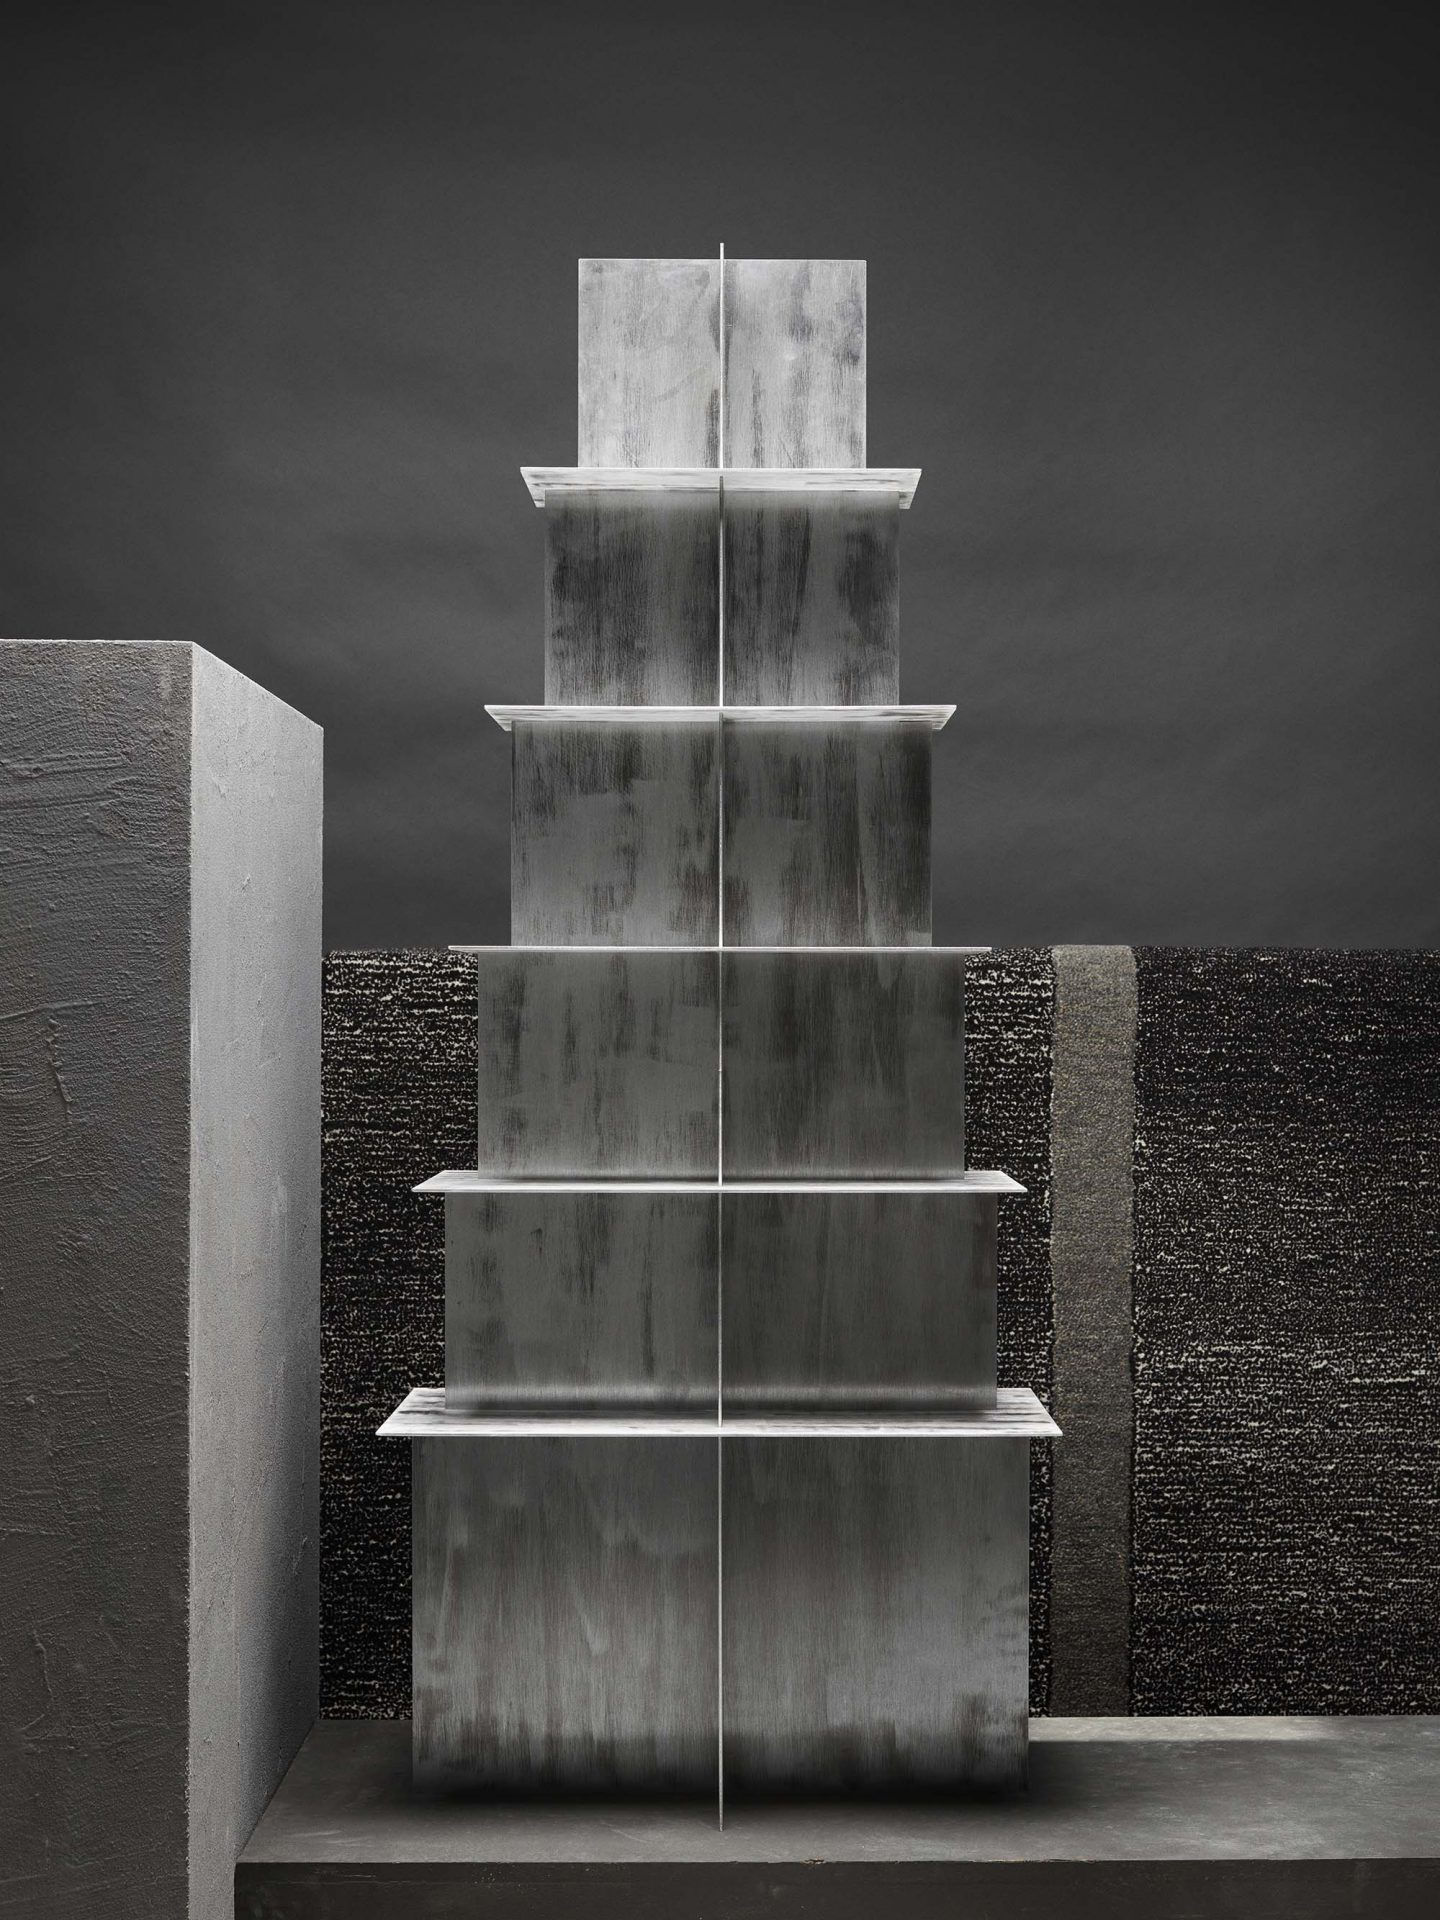 IGNANT-Design-Bram-Vanderbeke-38